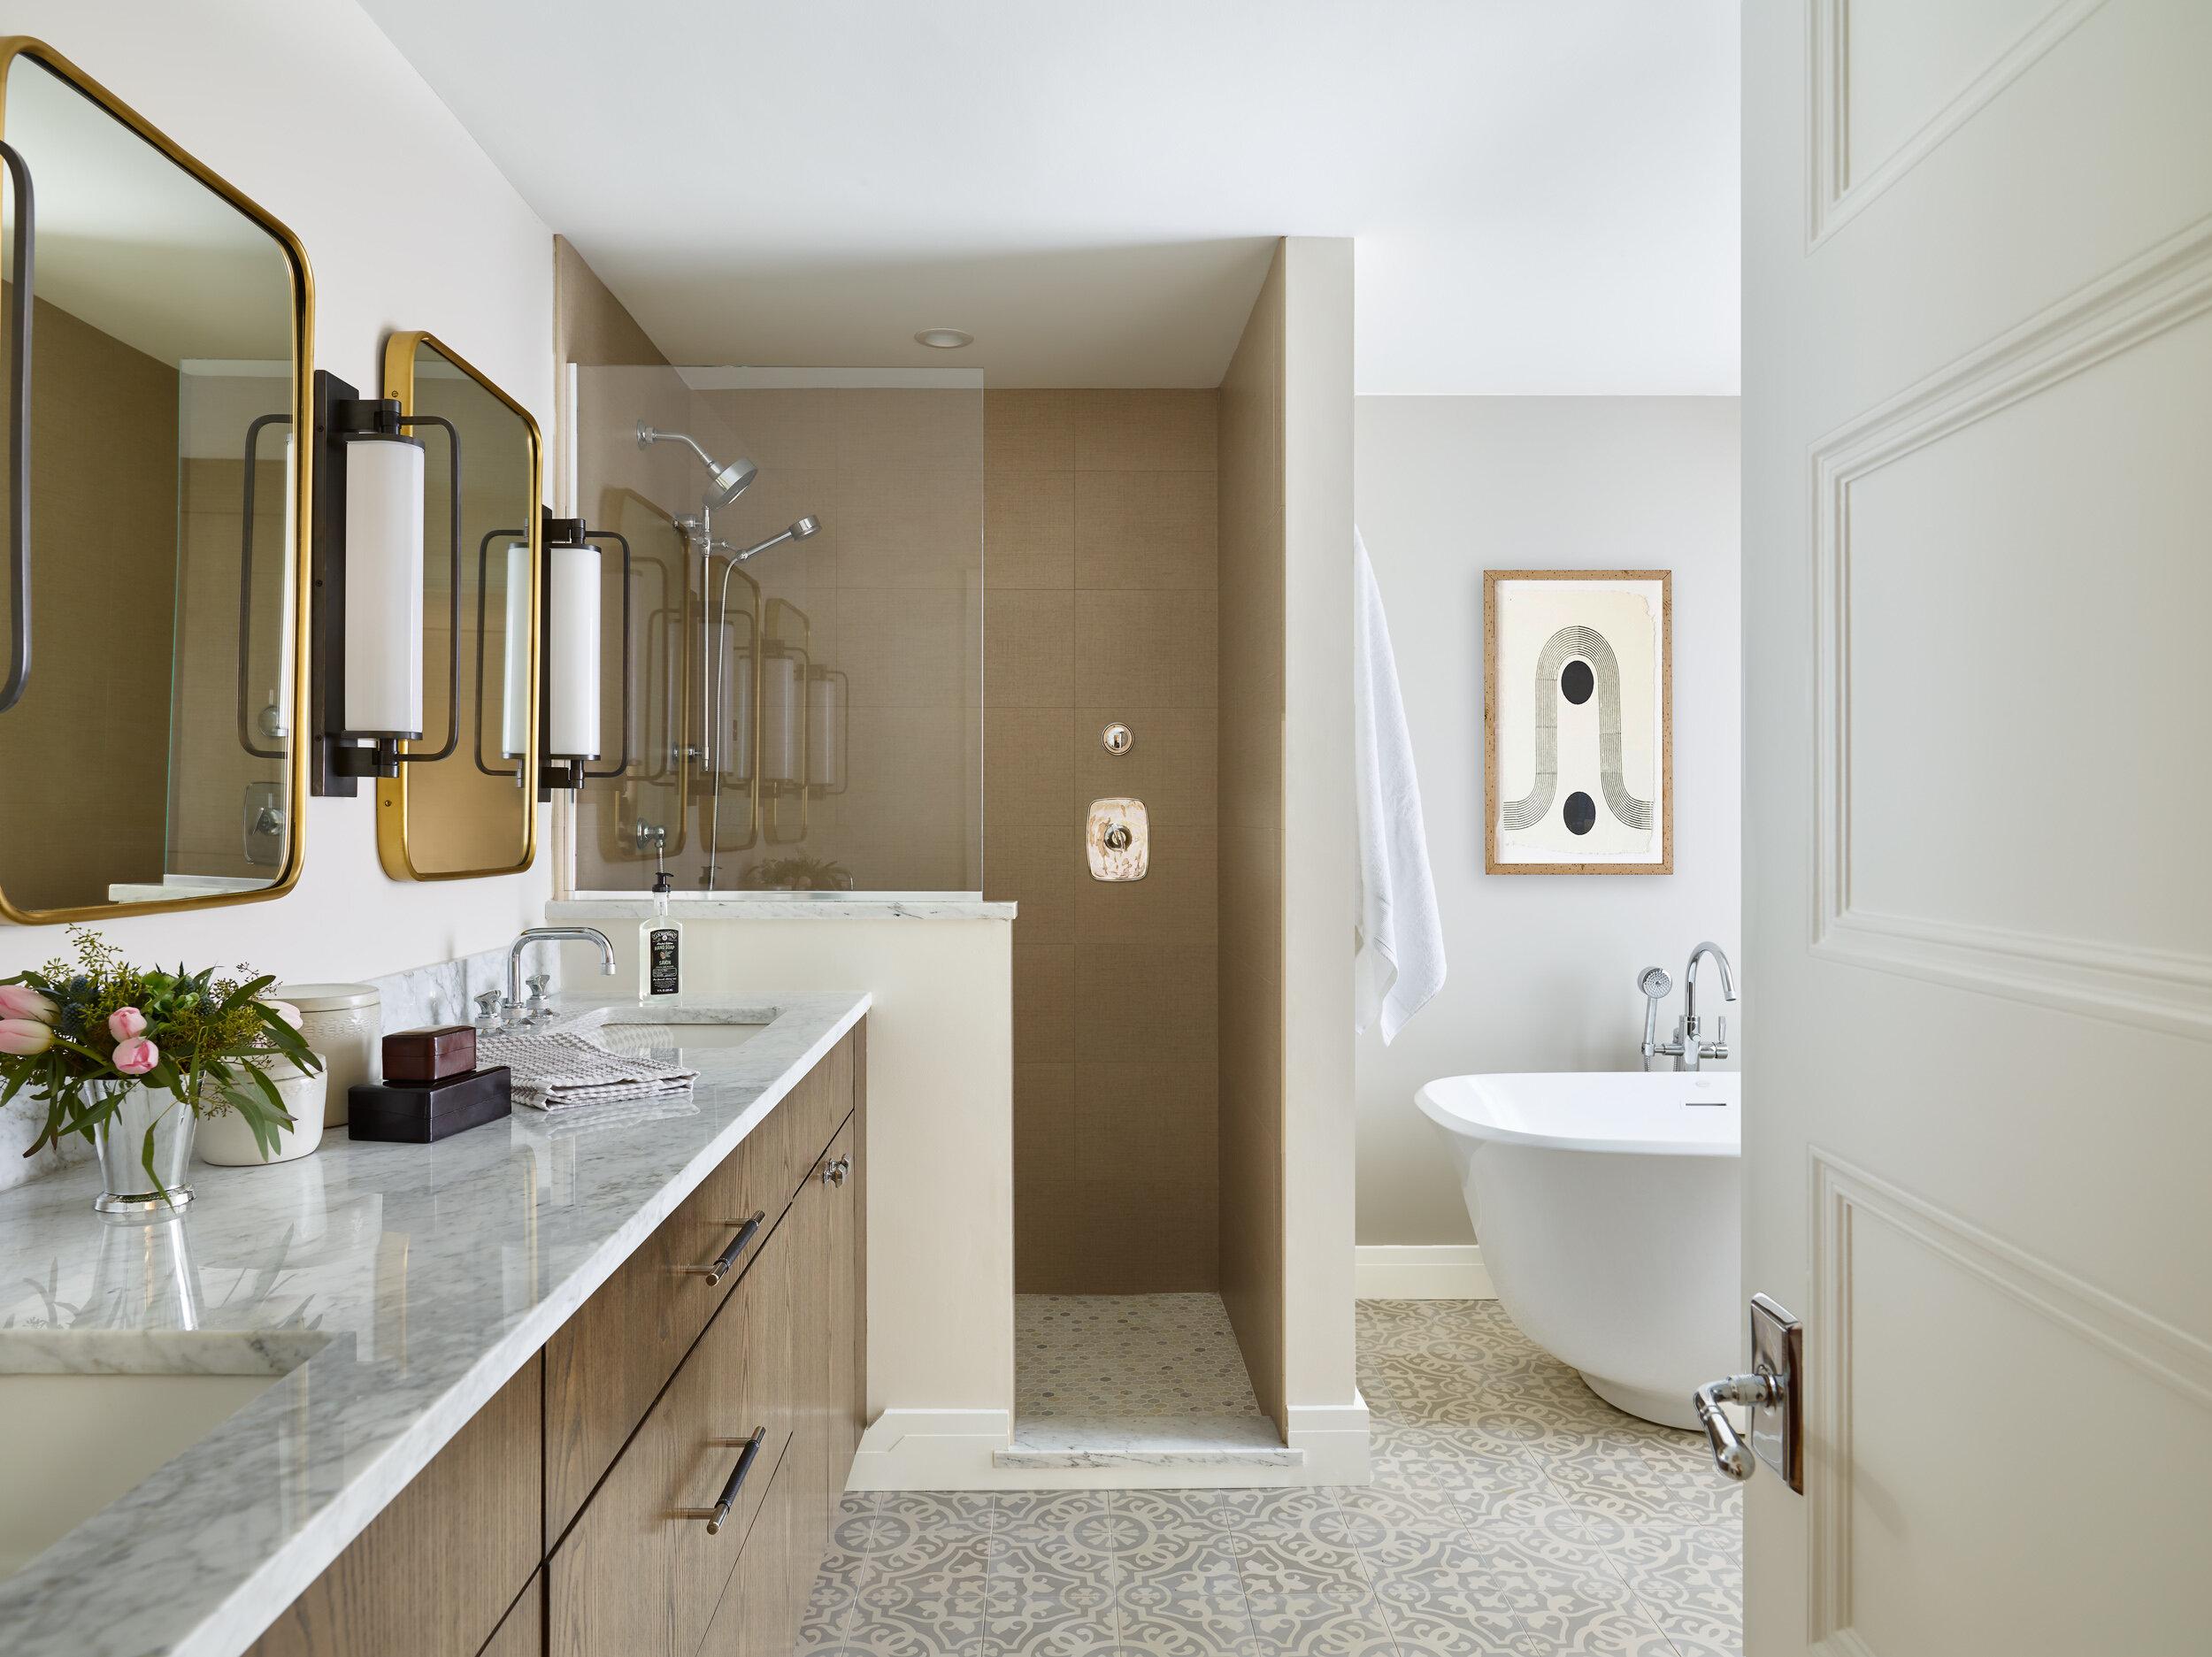 mackenzie-and-company-boston-westwood-interior-design-master-bathroom-style-2